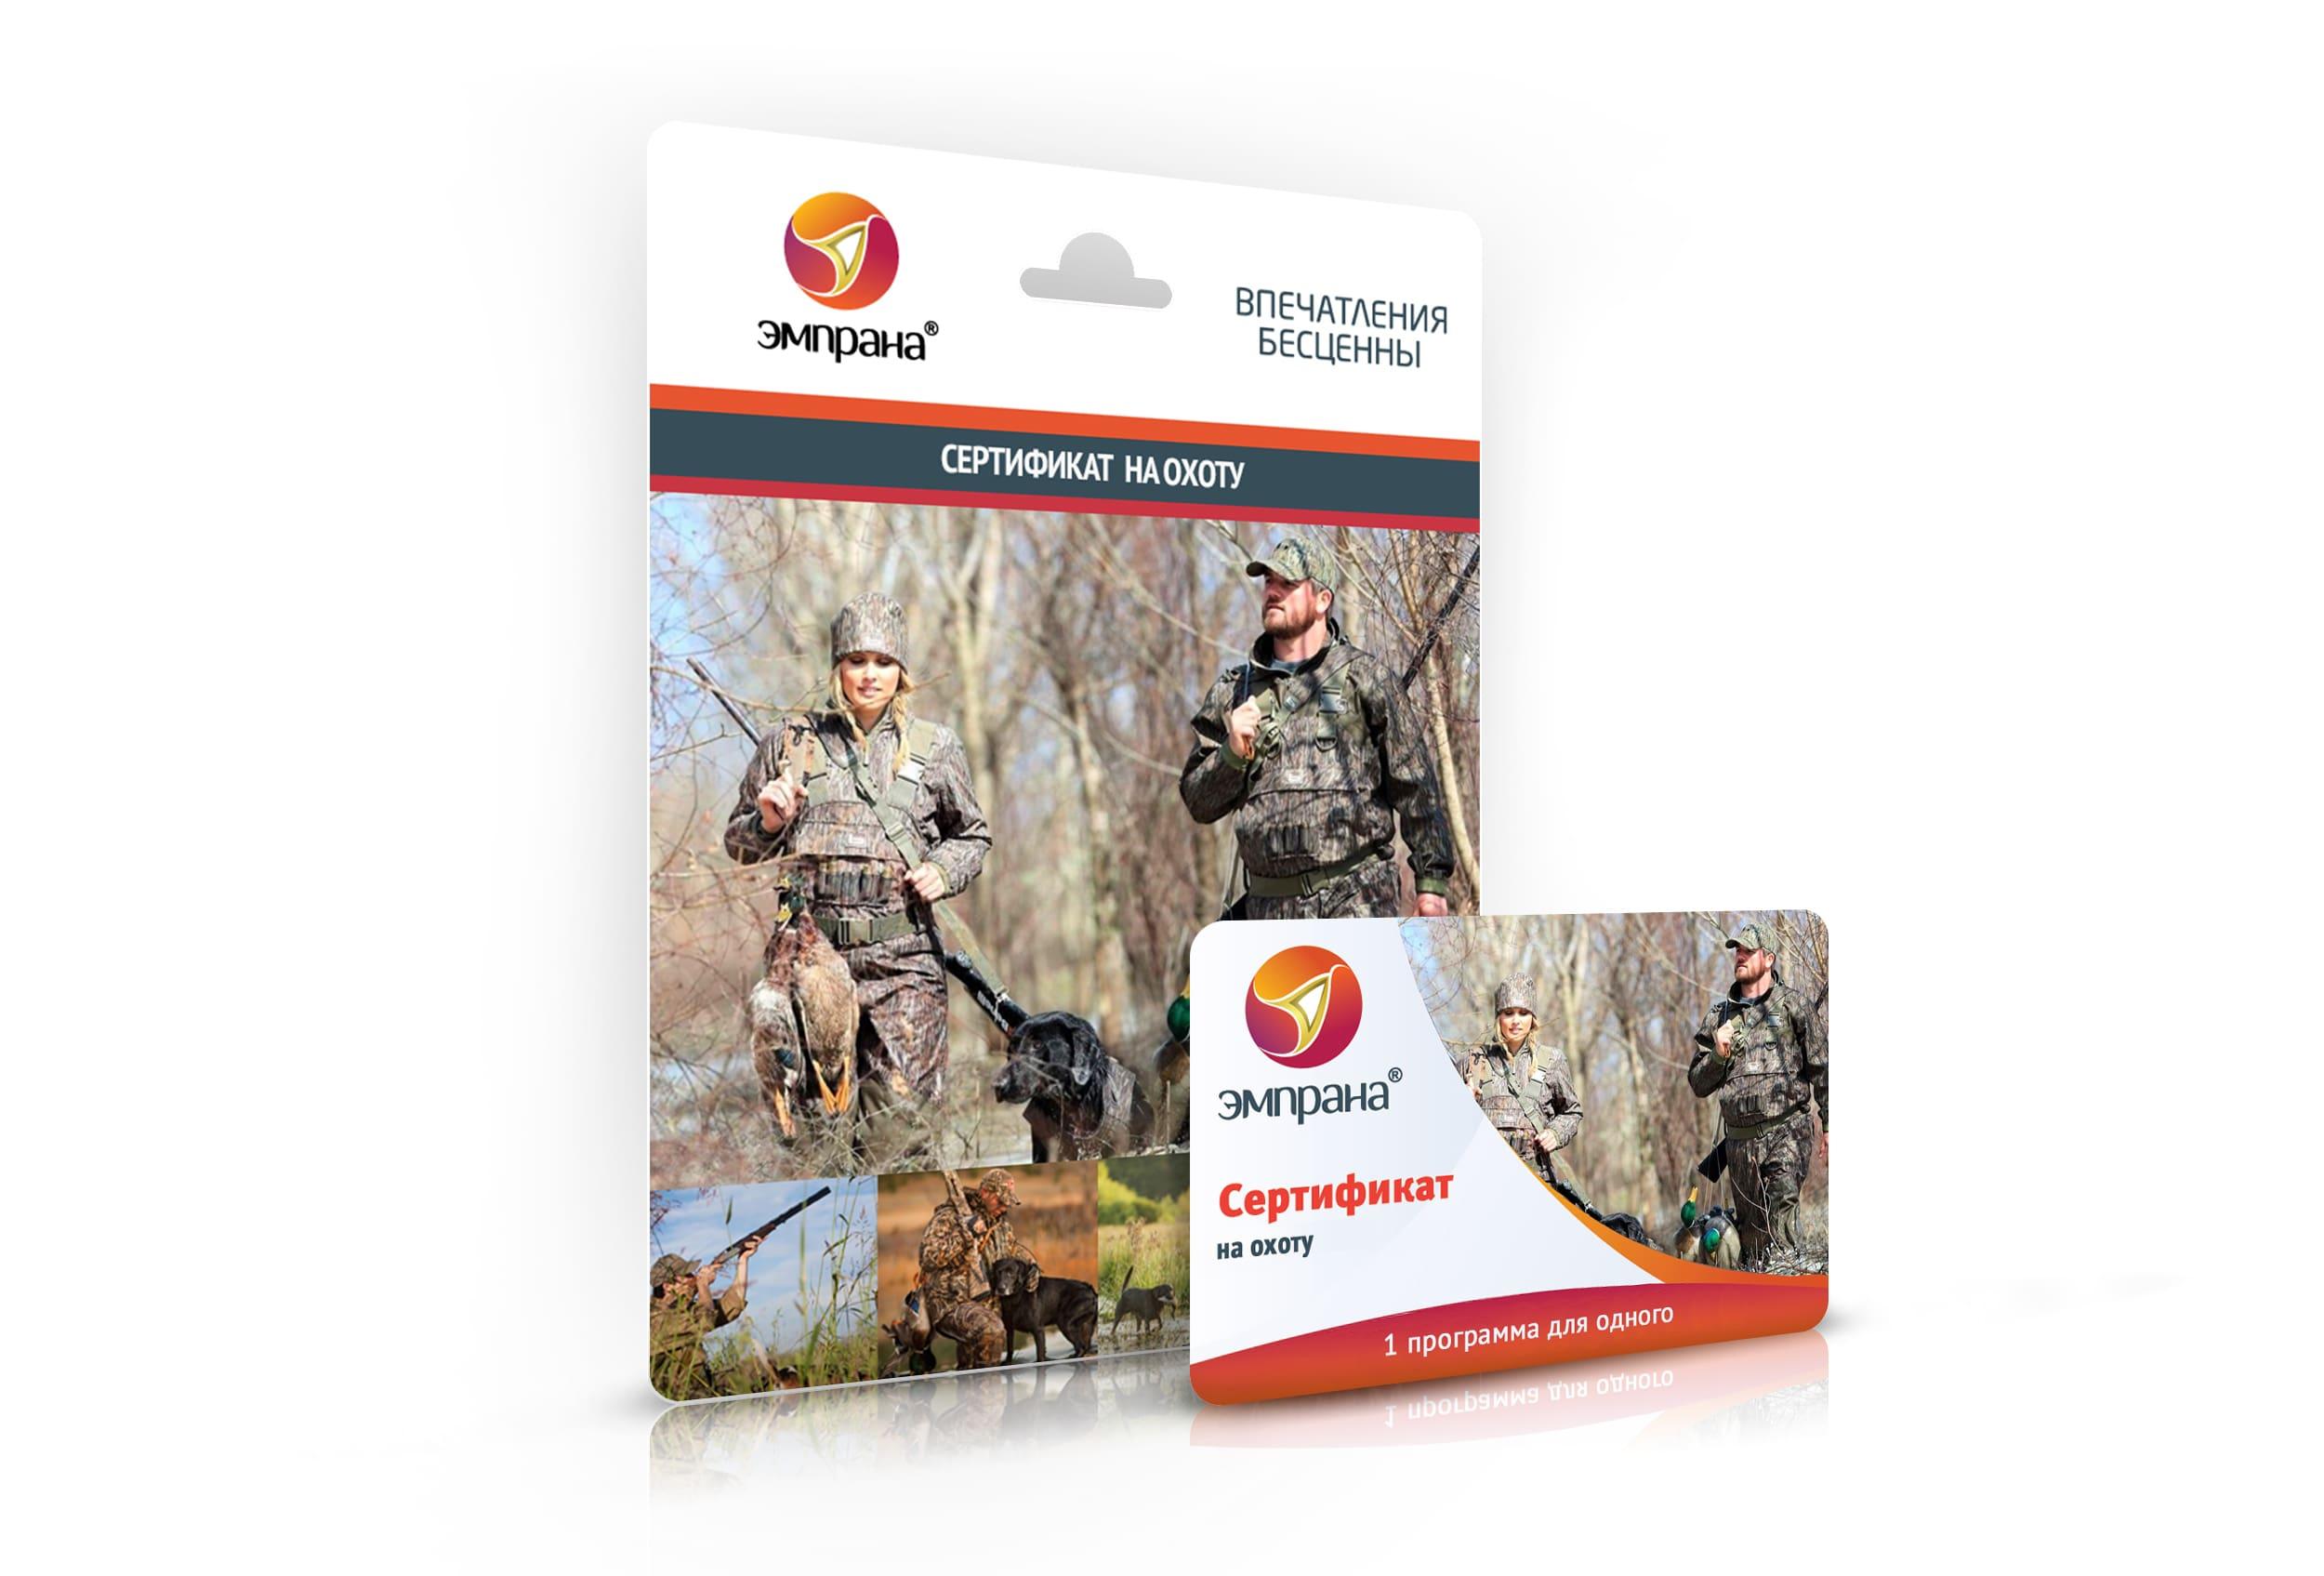 Сертификат на охоту